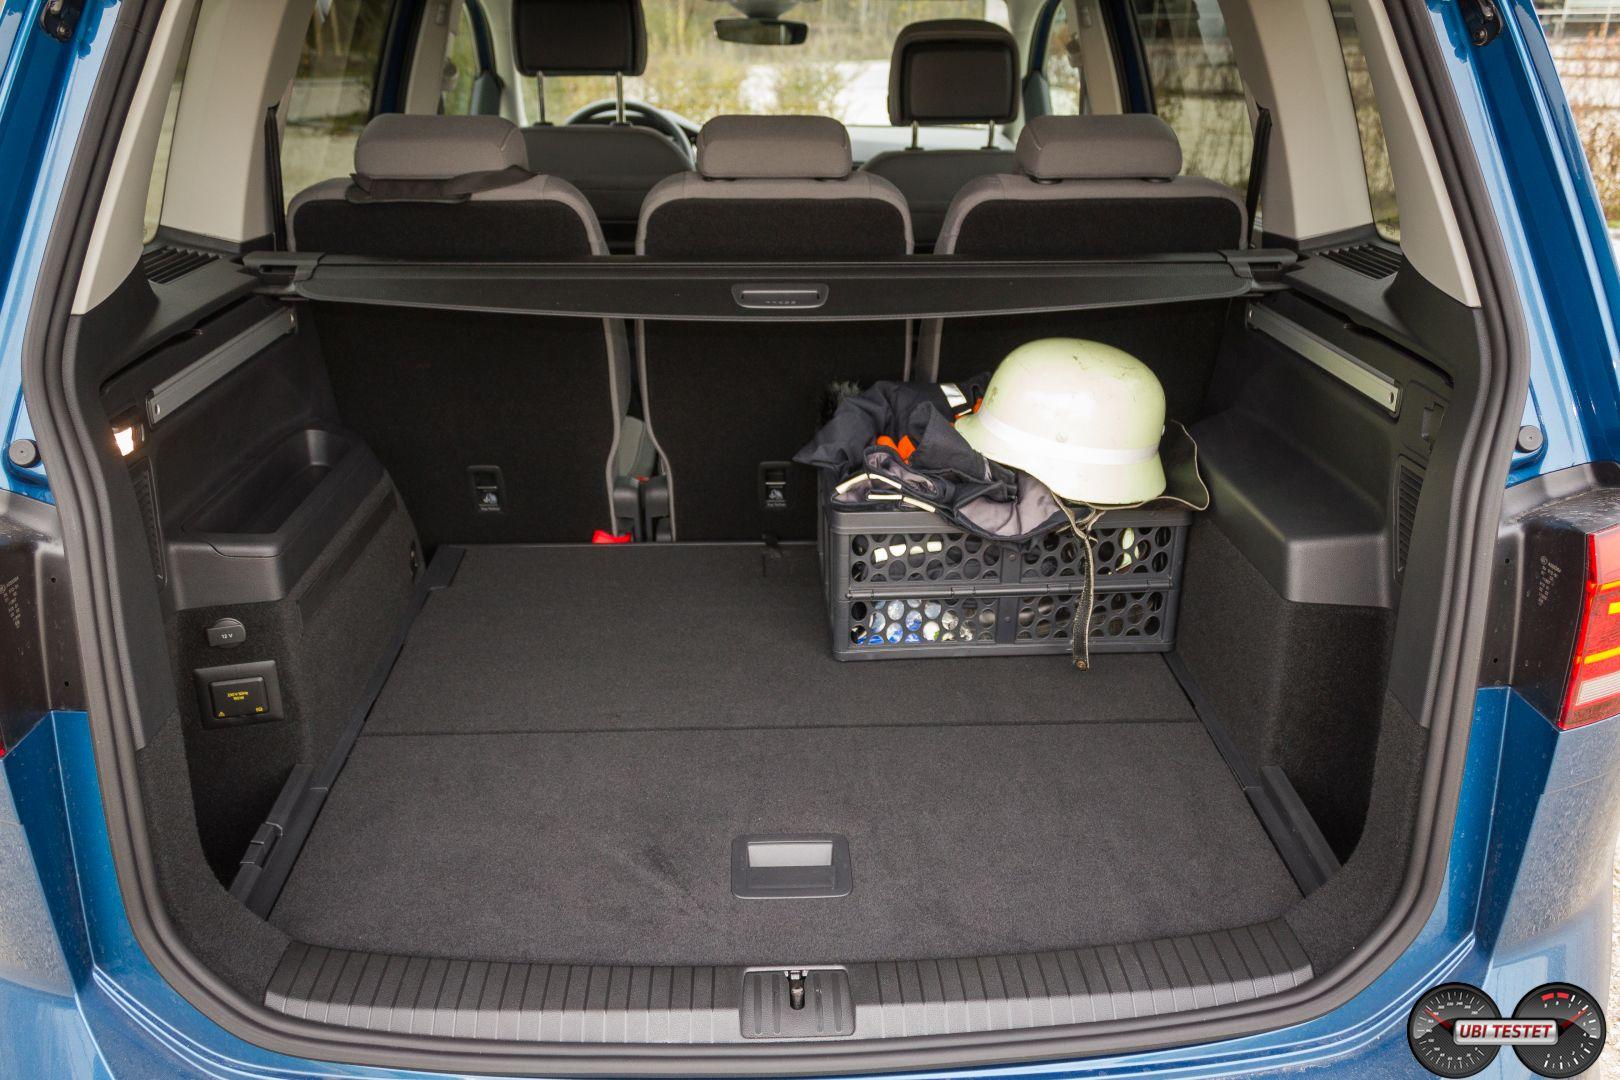 vw touran kofferraum 5 sitzer ubi testet. Black Bedroom Furniture Sets. Home Design Ideas